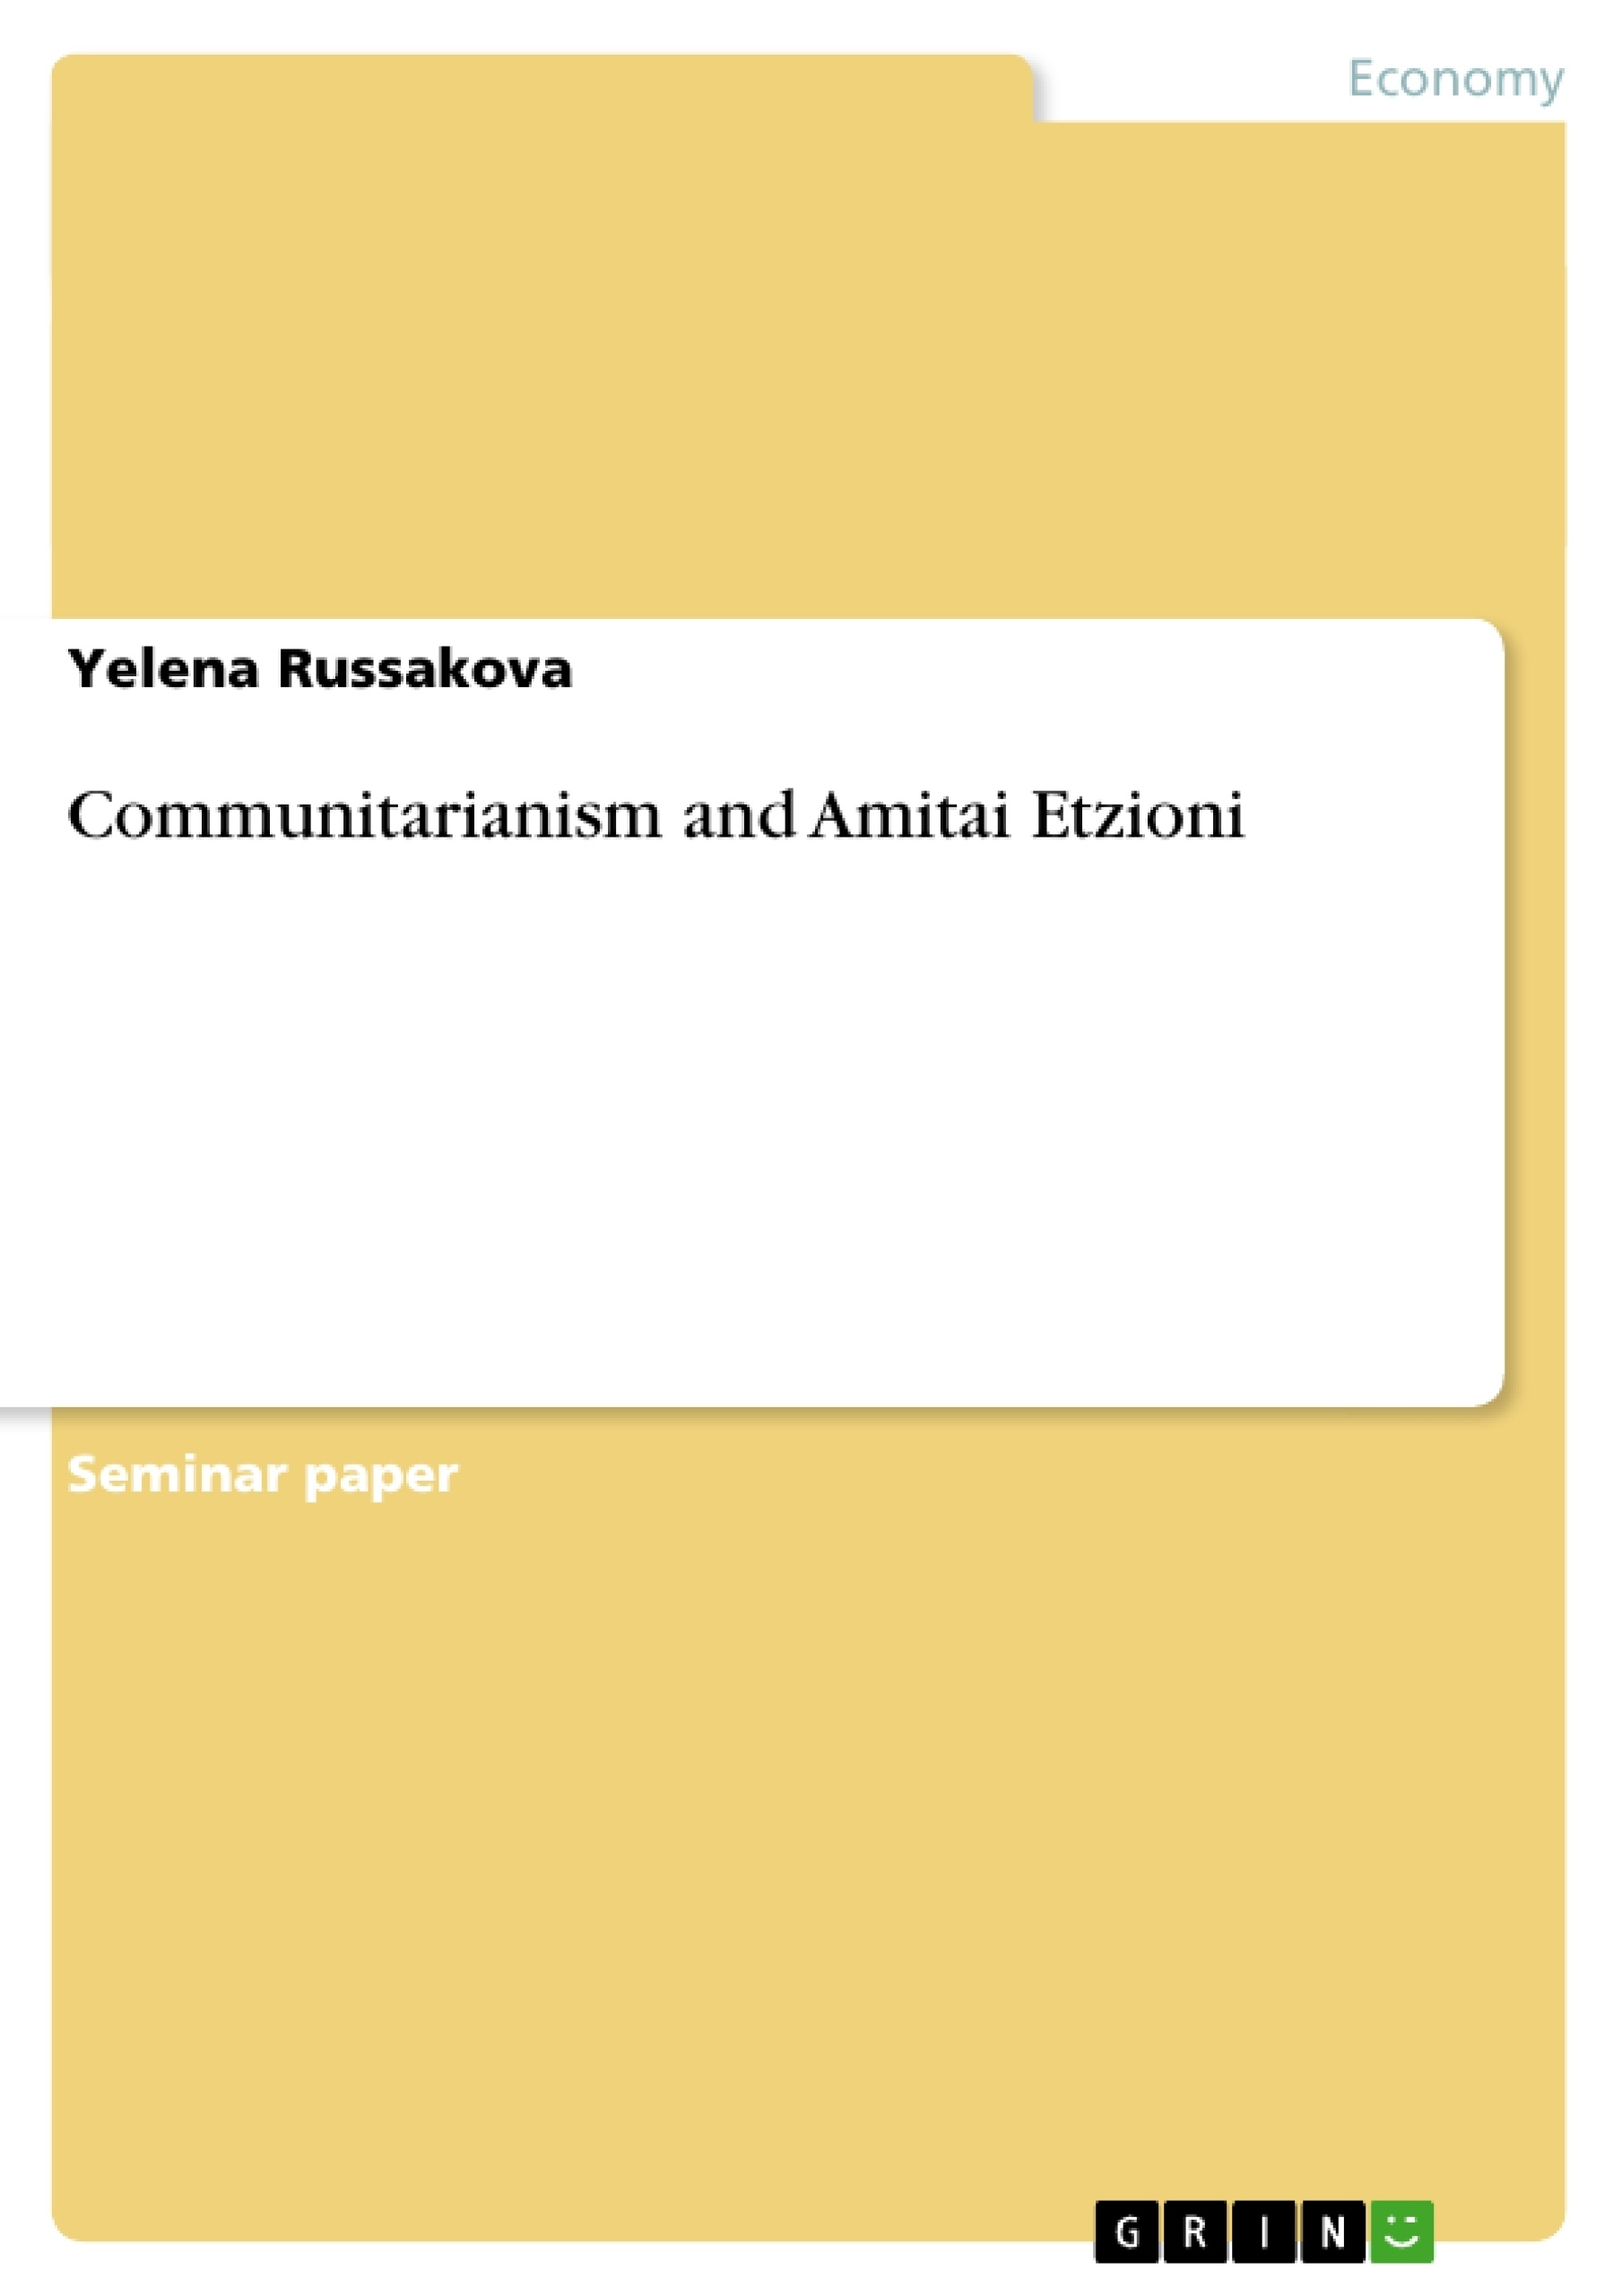 Title: Communitarianism and Amitai Etzioni